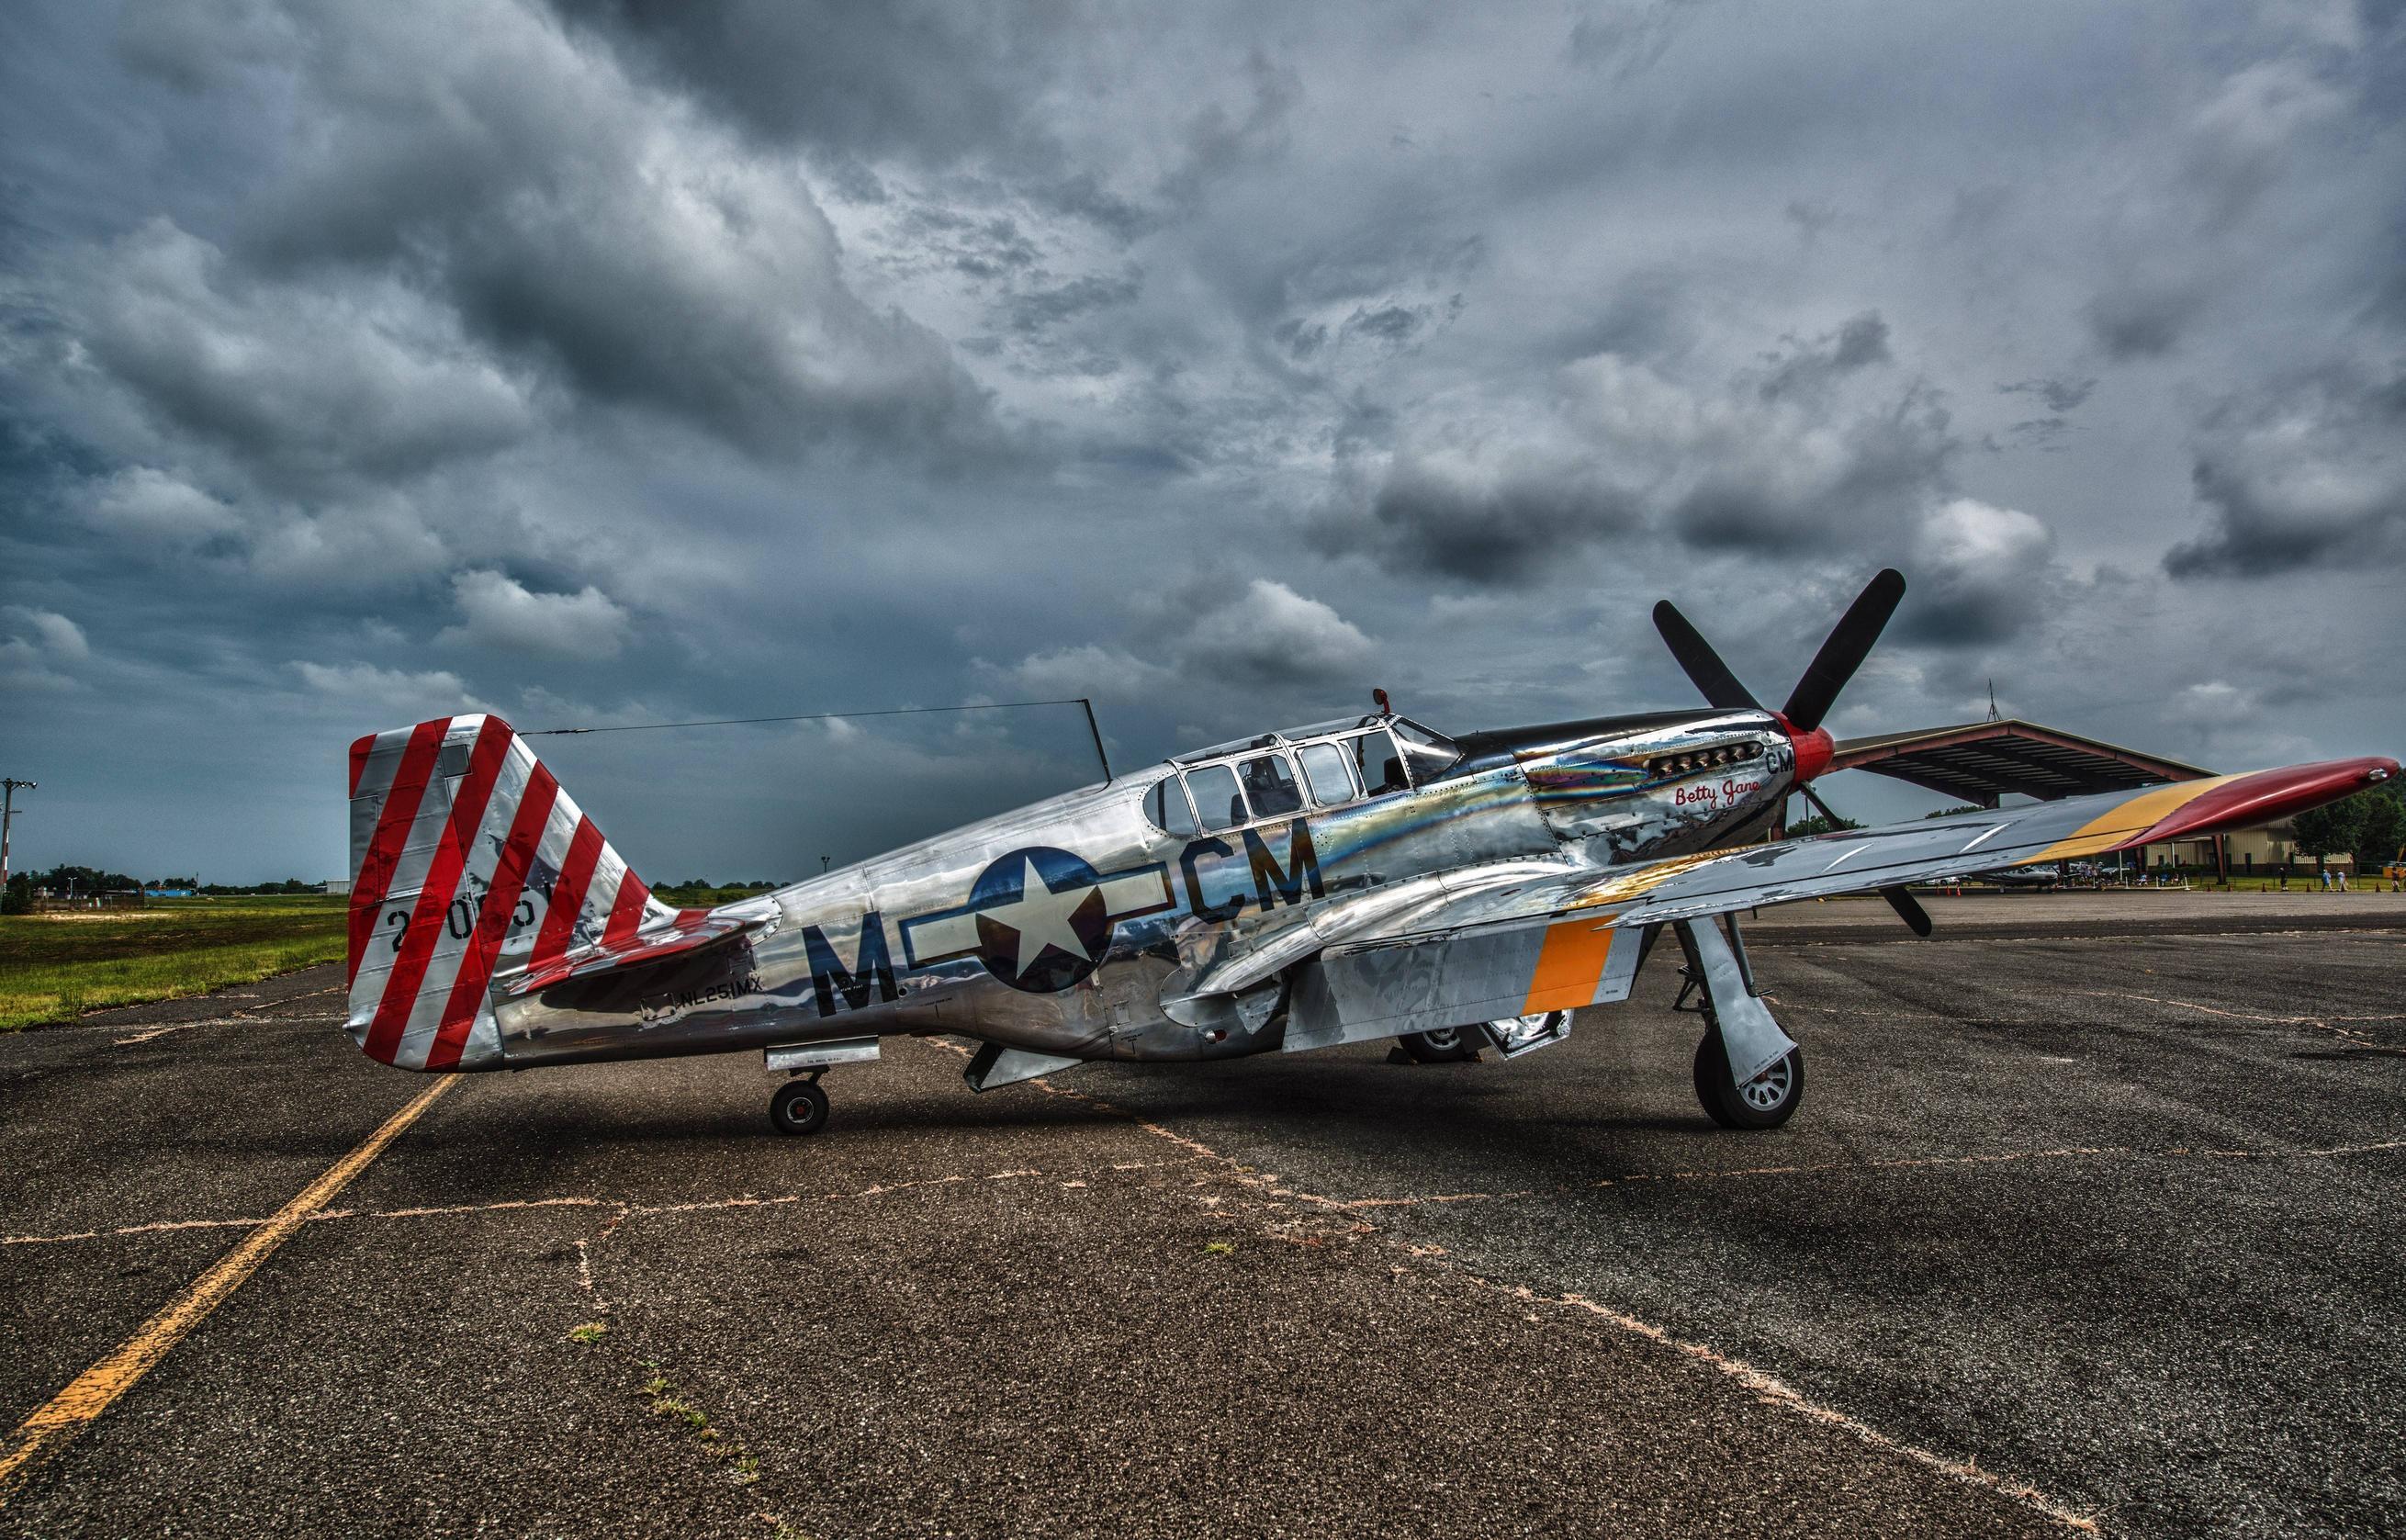 Vintage Airplane Wallpapers - Wallpaper Cave |Vintage Jet Planes